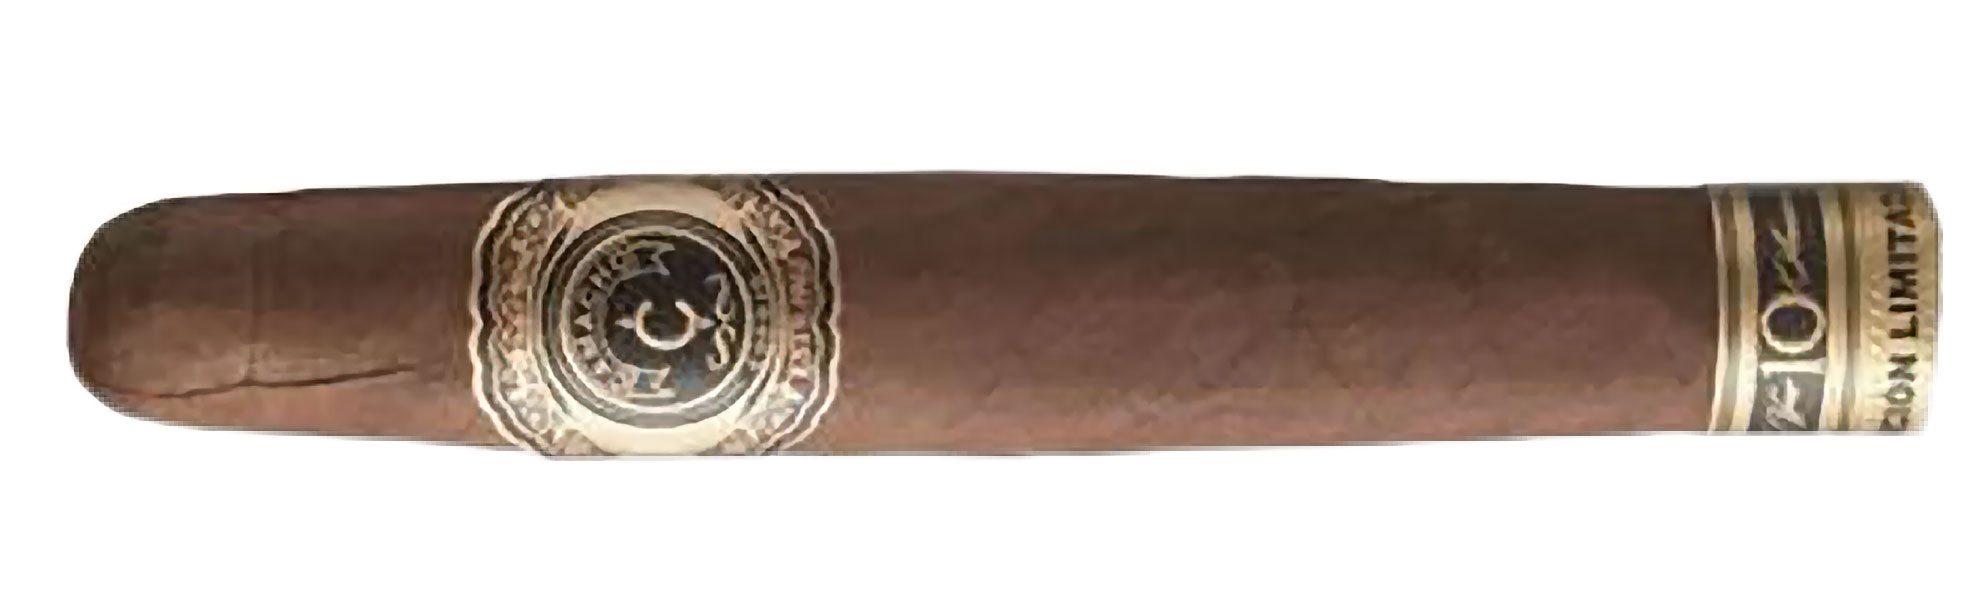 Blind Cigar Review: Camacho   10th Anniversary 11/18